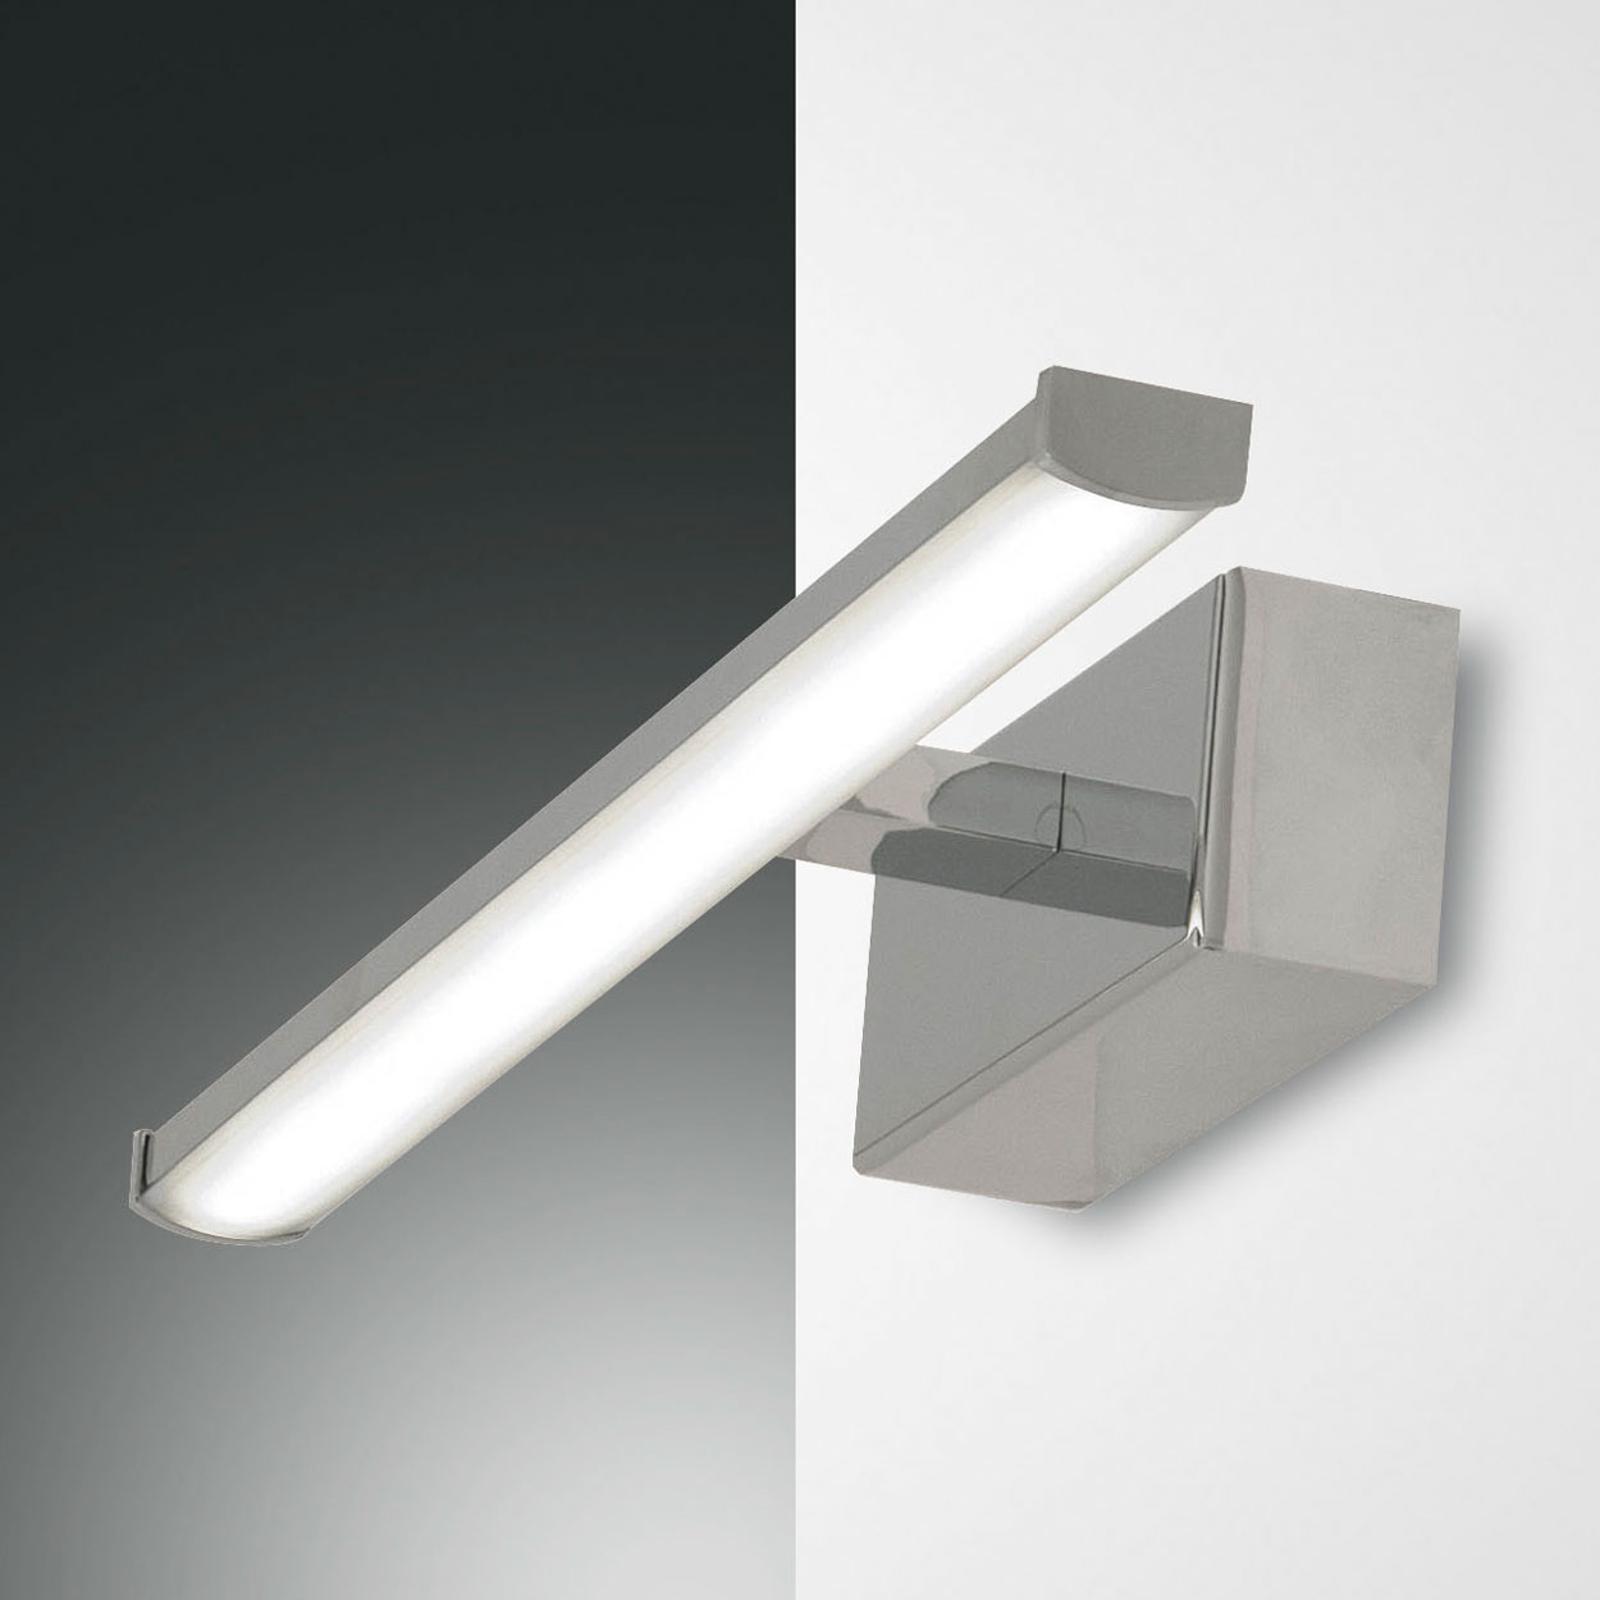 LED-vägglampa Nala, krom, bredd 30 cm